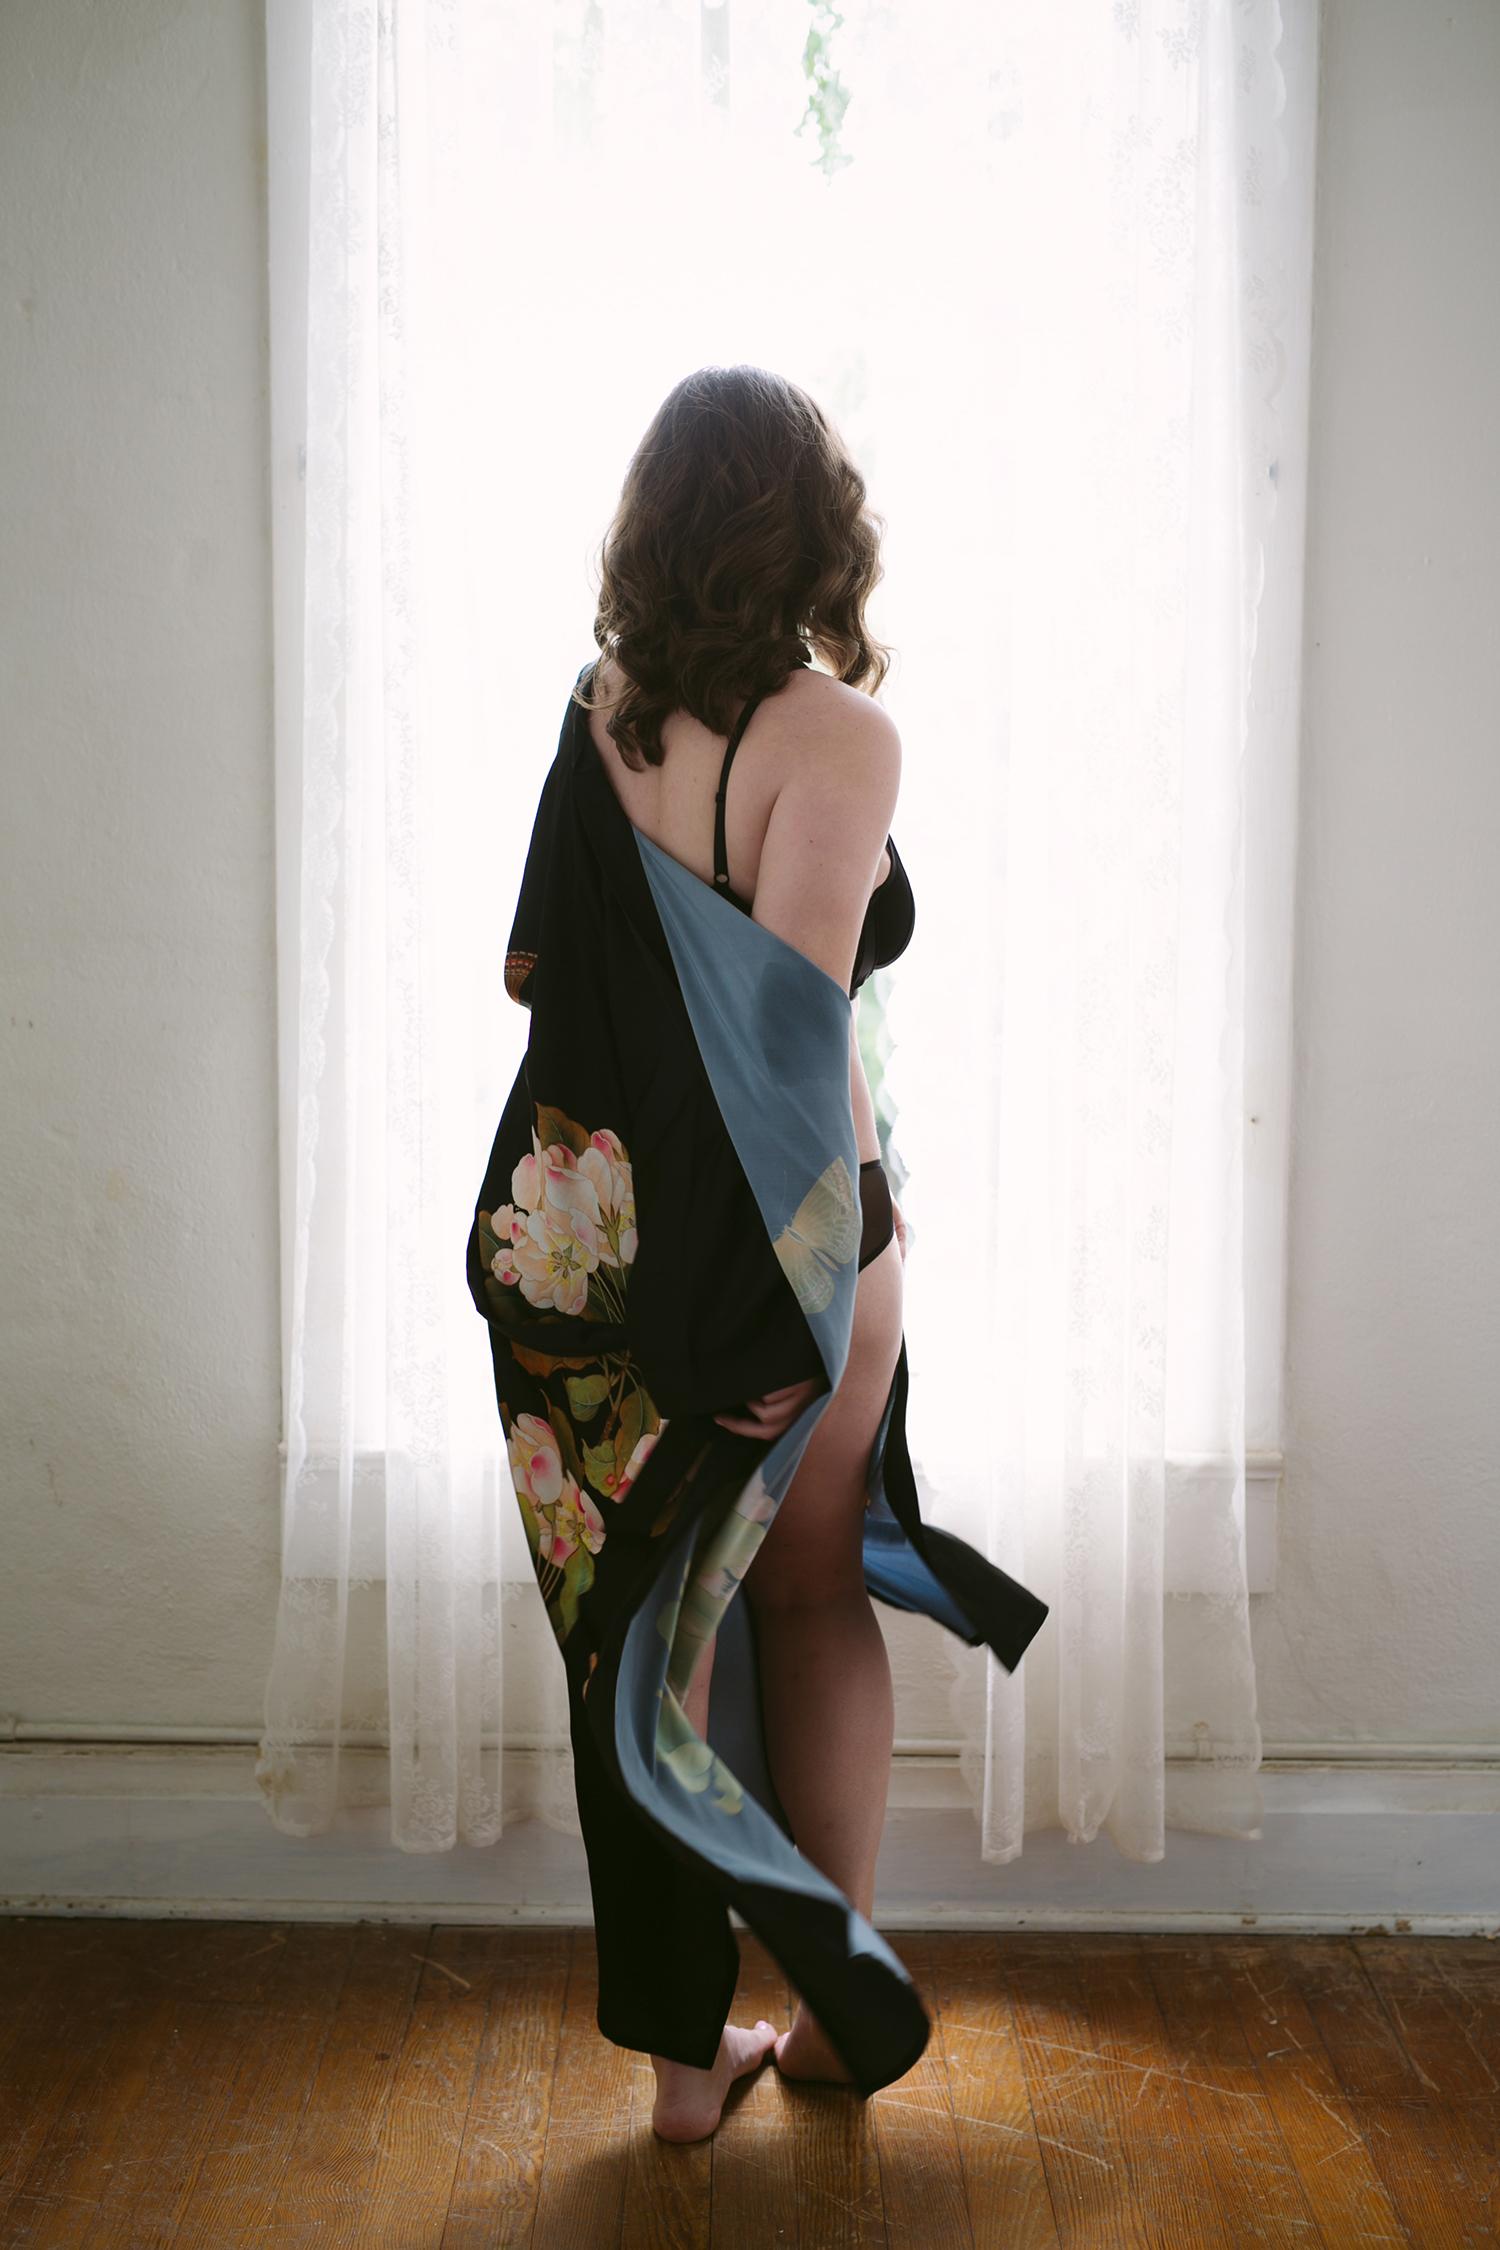 austin-texas-classy-boudoir-photography-KBB13.jpg